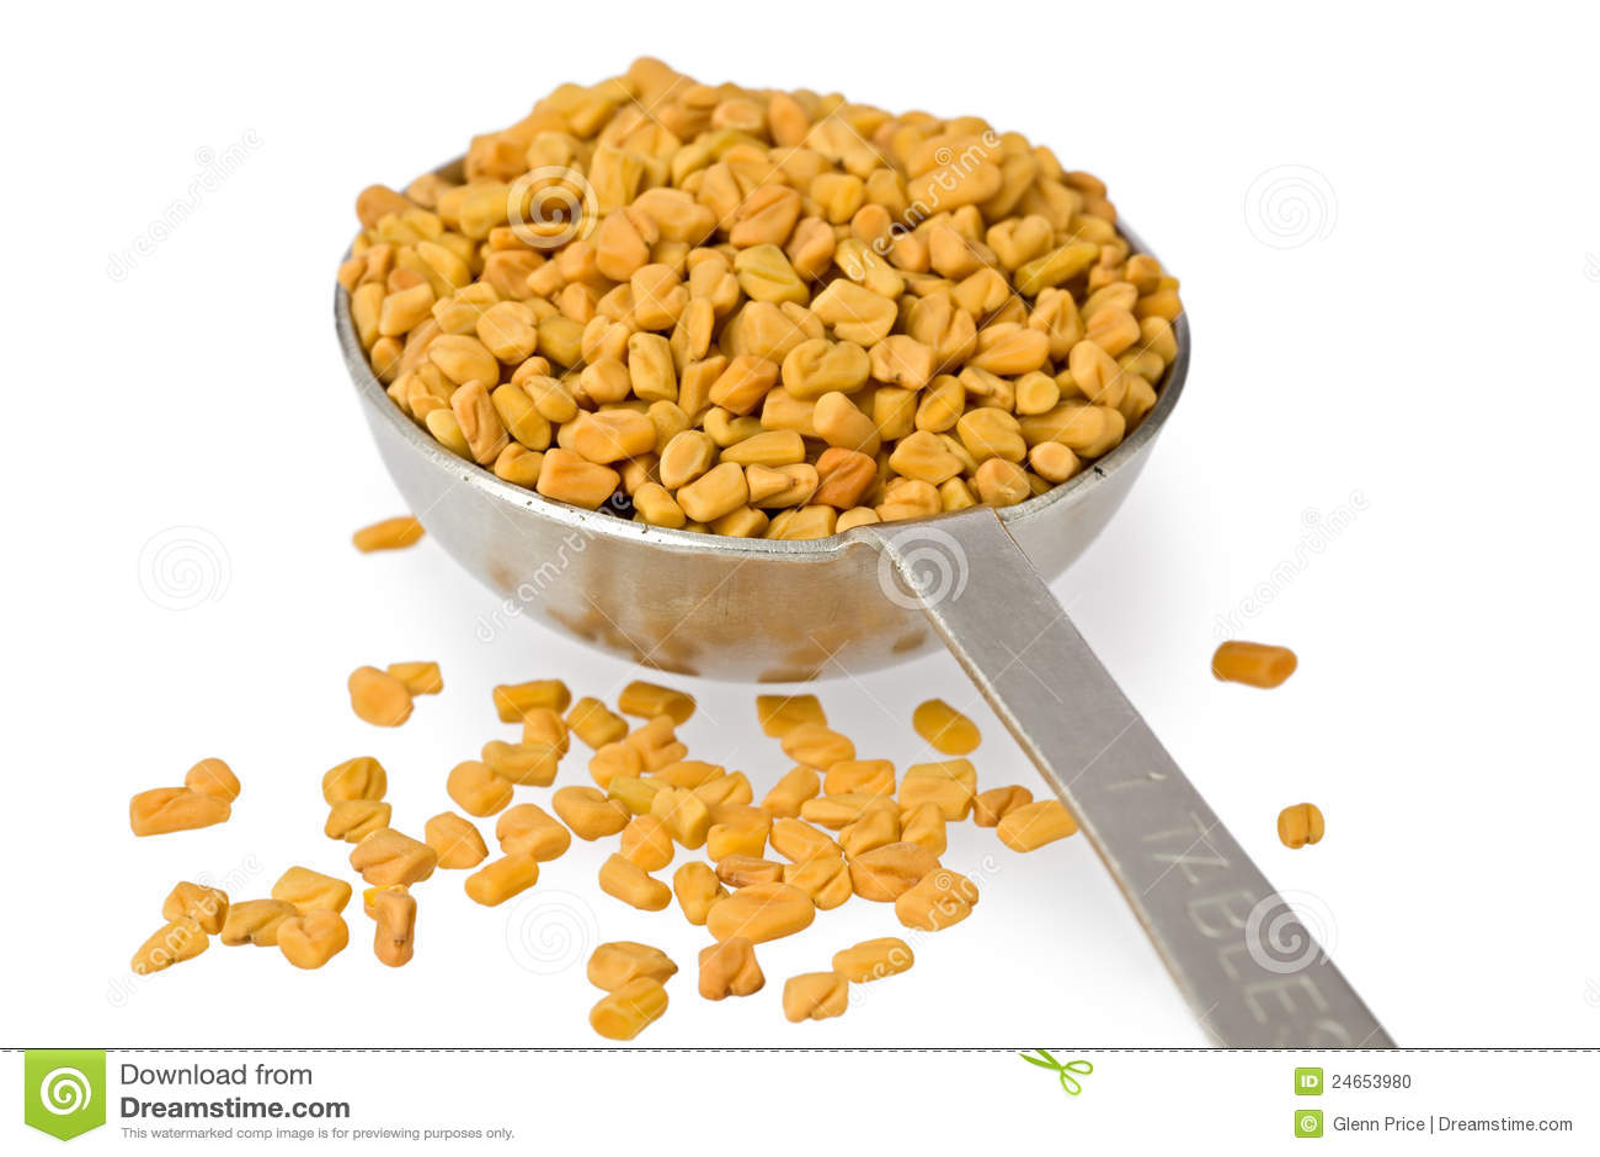 how to eat fenugreek seeds